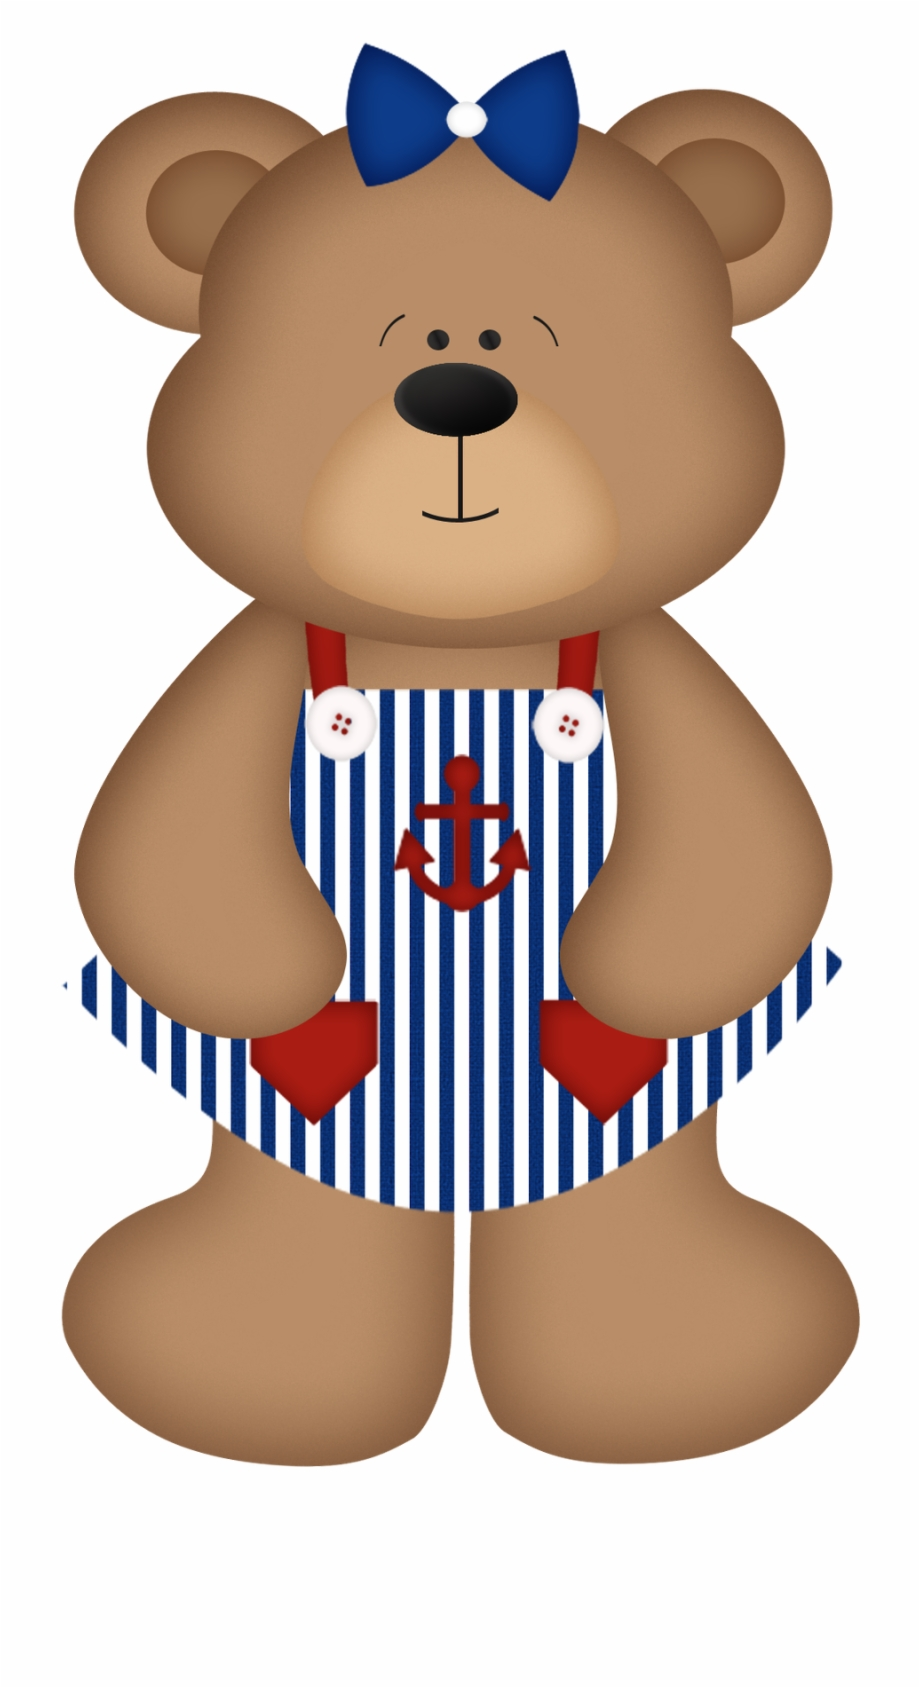 Teddy bear clipart pinterest image free download Jpg Stock Girl Printables Pinterest Bears Clip Art - Desenho ... image free download